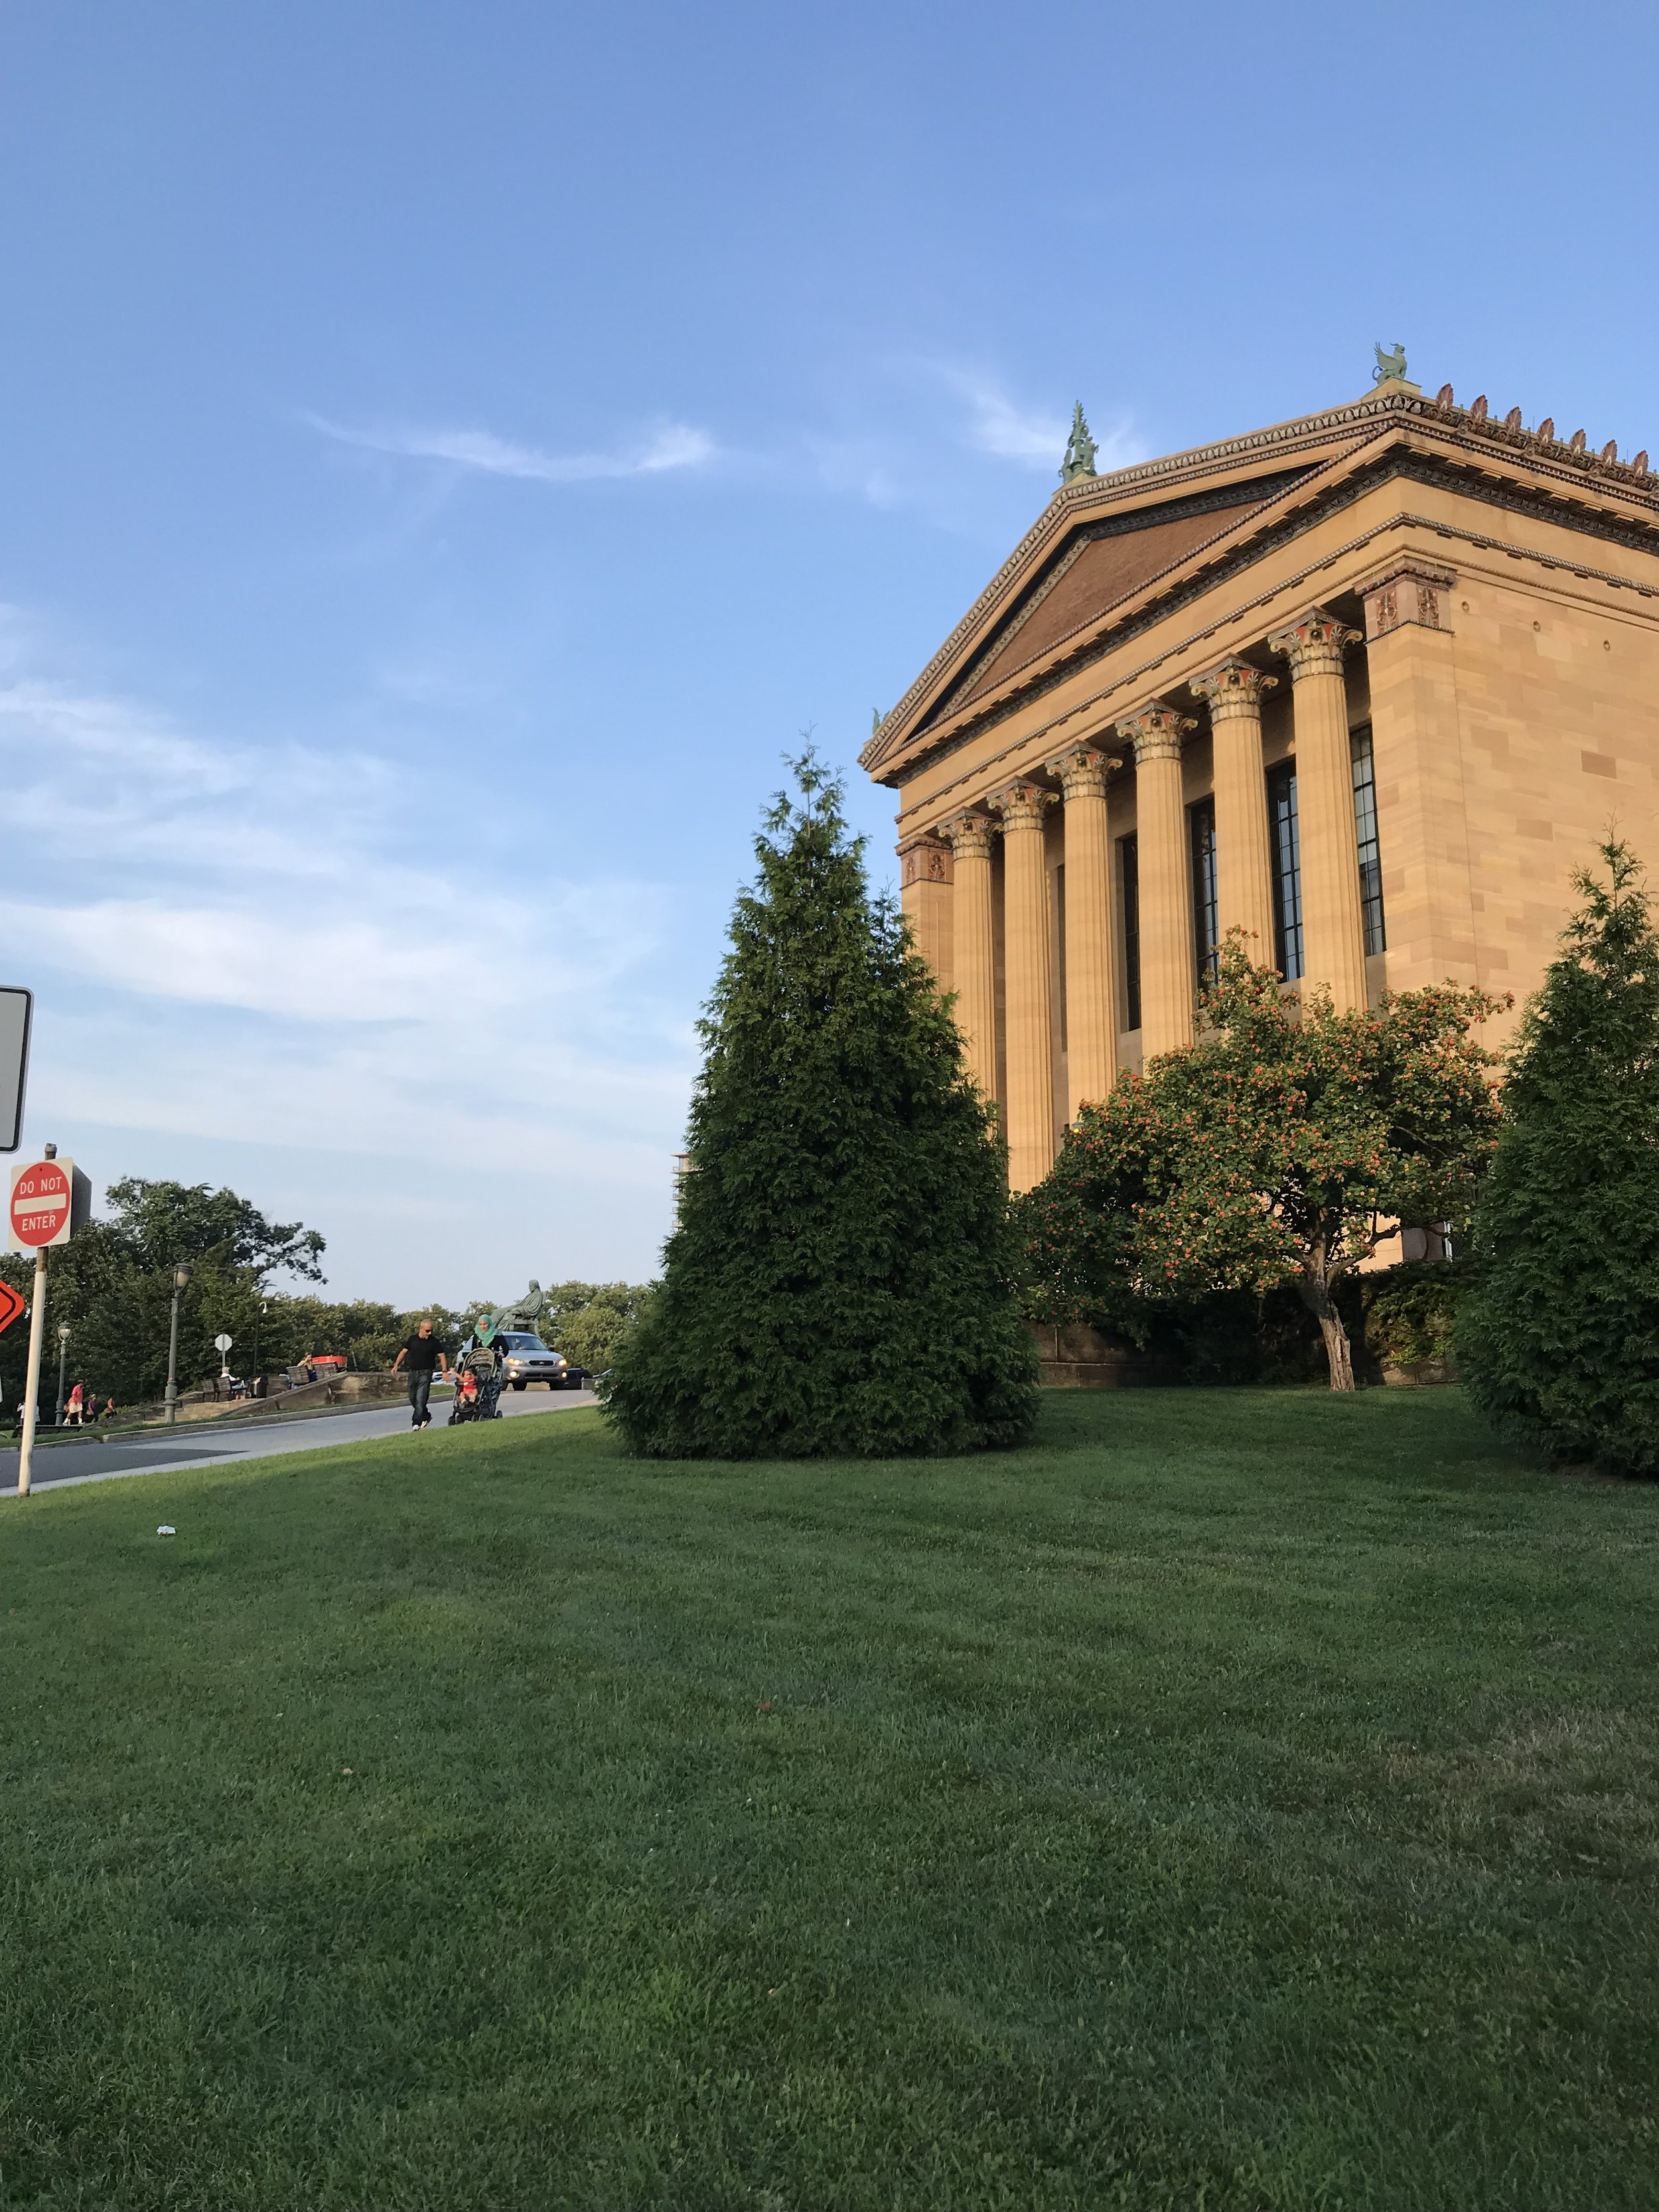 Philadelphia Museum of Art, AKA the location of the famous ROCKY stair scene!